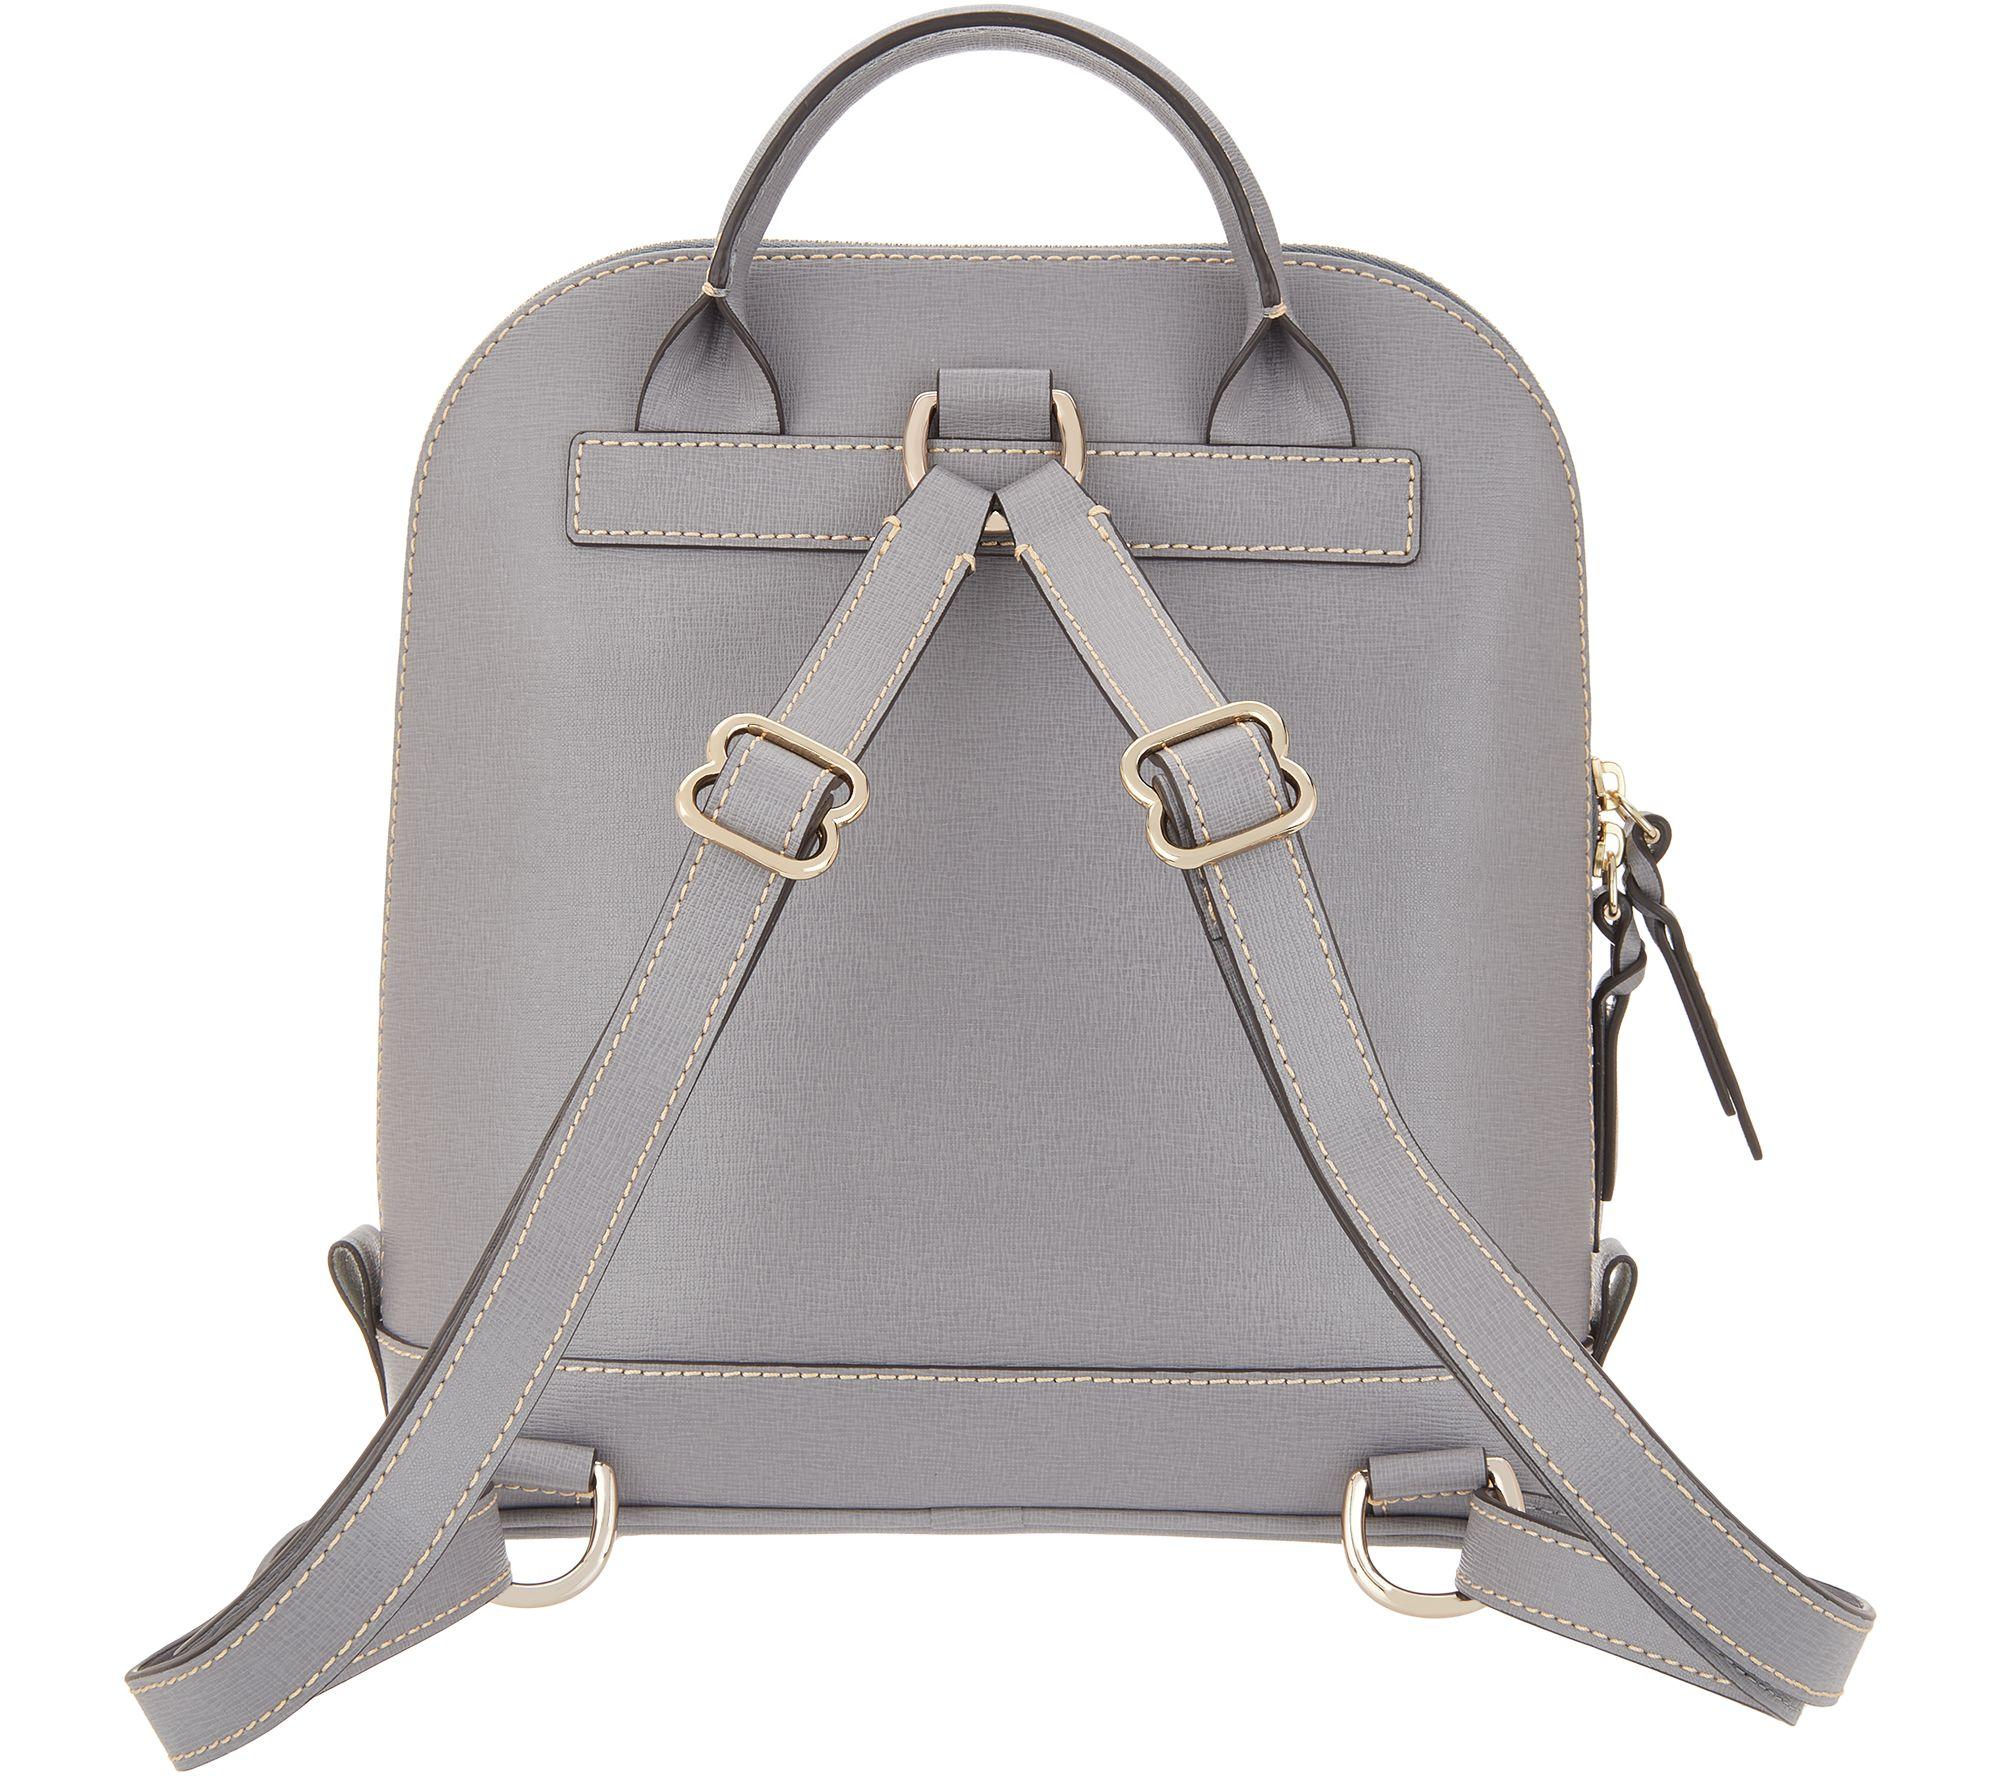 7af273d330 Dooney   Bourke Saffiano Leather Pod Backpack - Page 1 — QVC.com